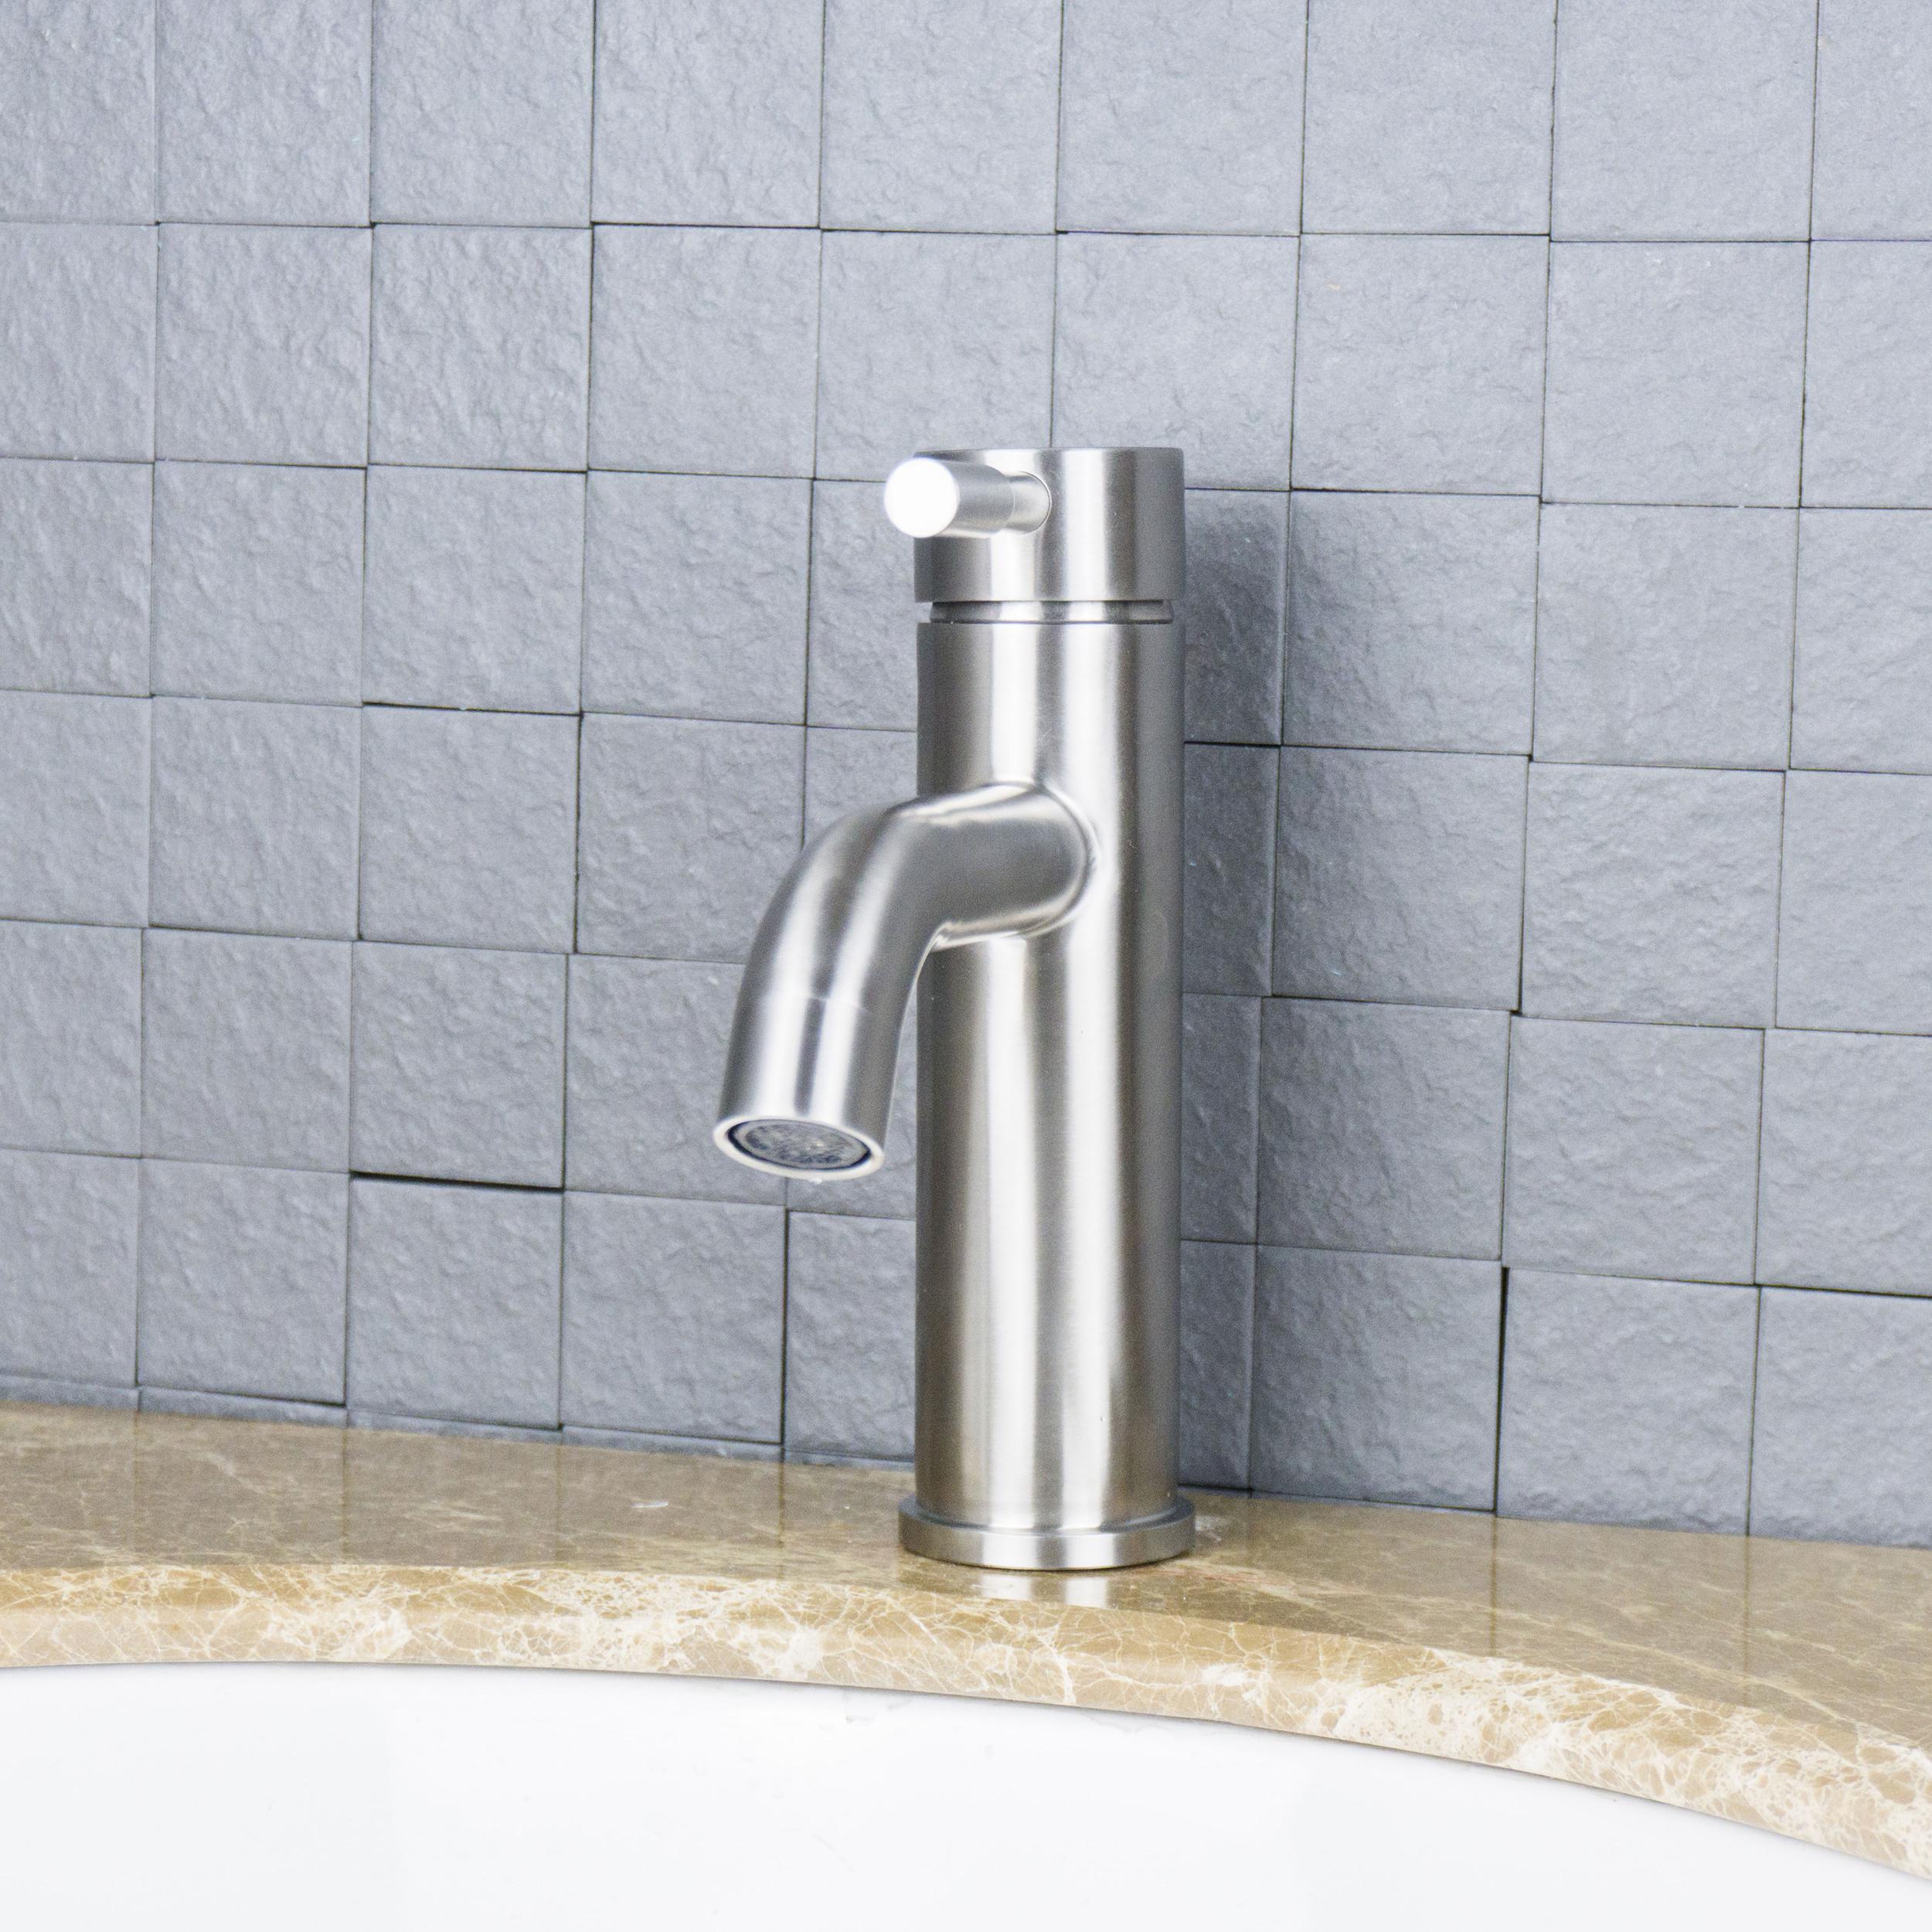 Eviva Ramo Single Hole One Handle Bathroom Faucet In Brushed Nickel - Nickel finish bathroom faucets